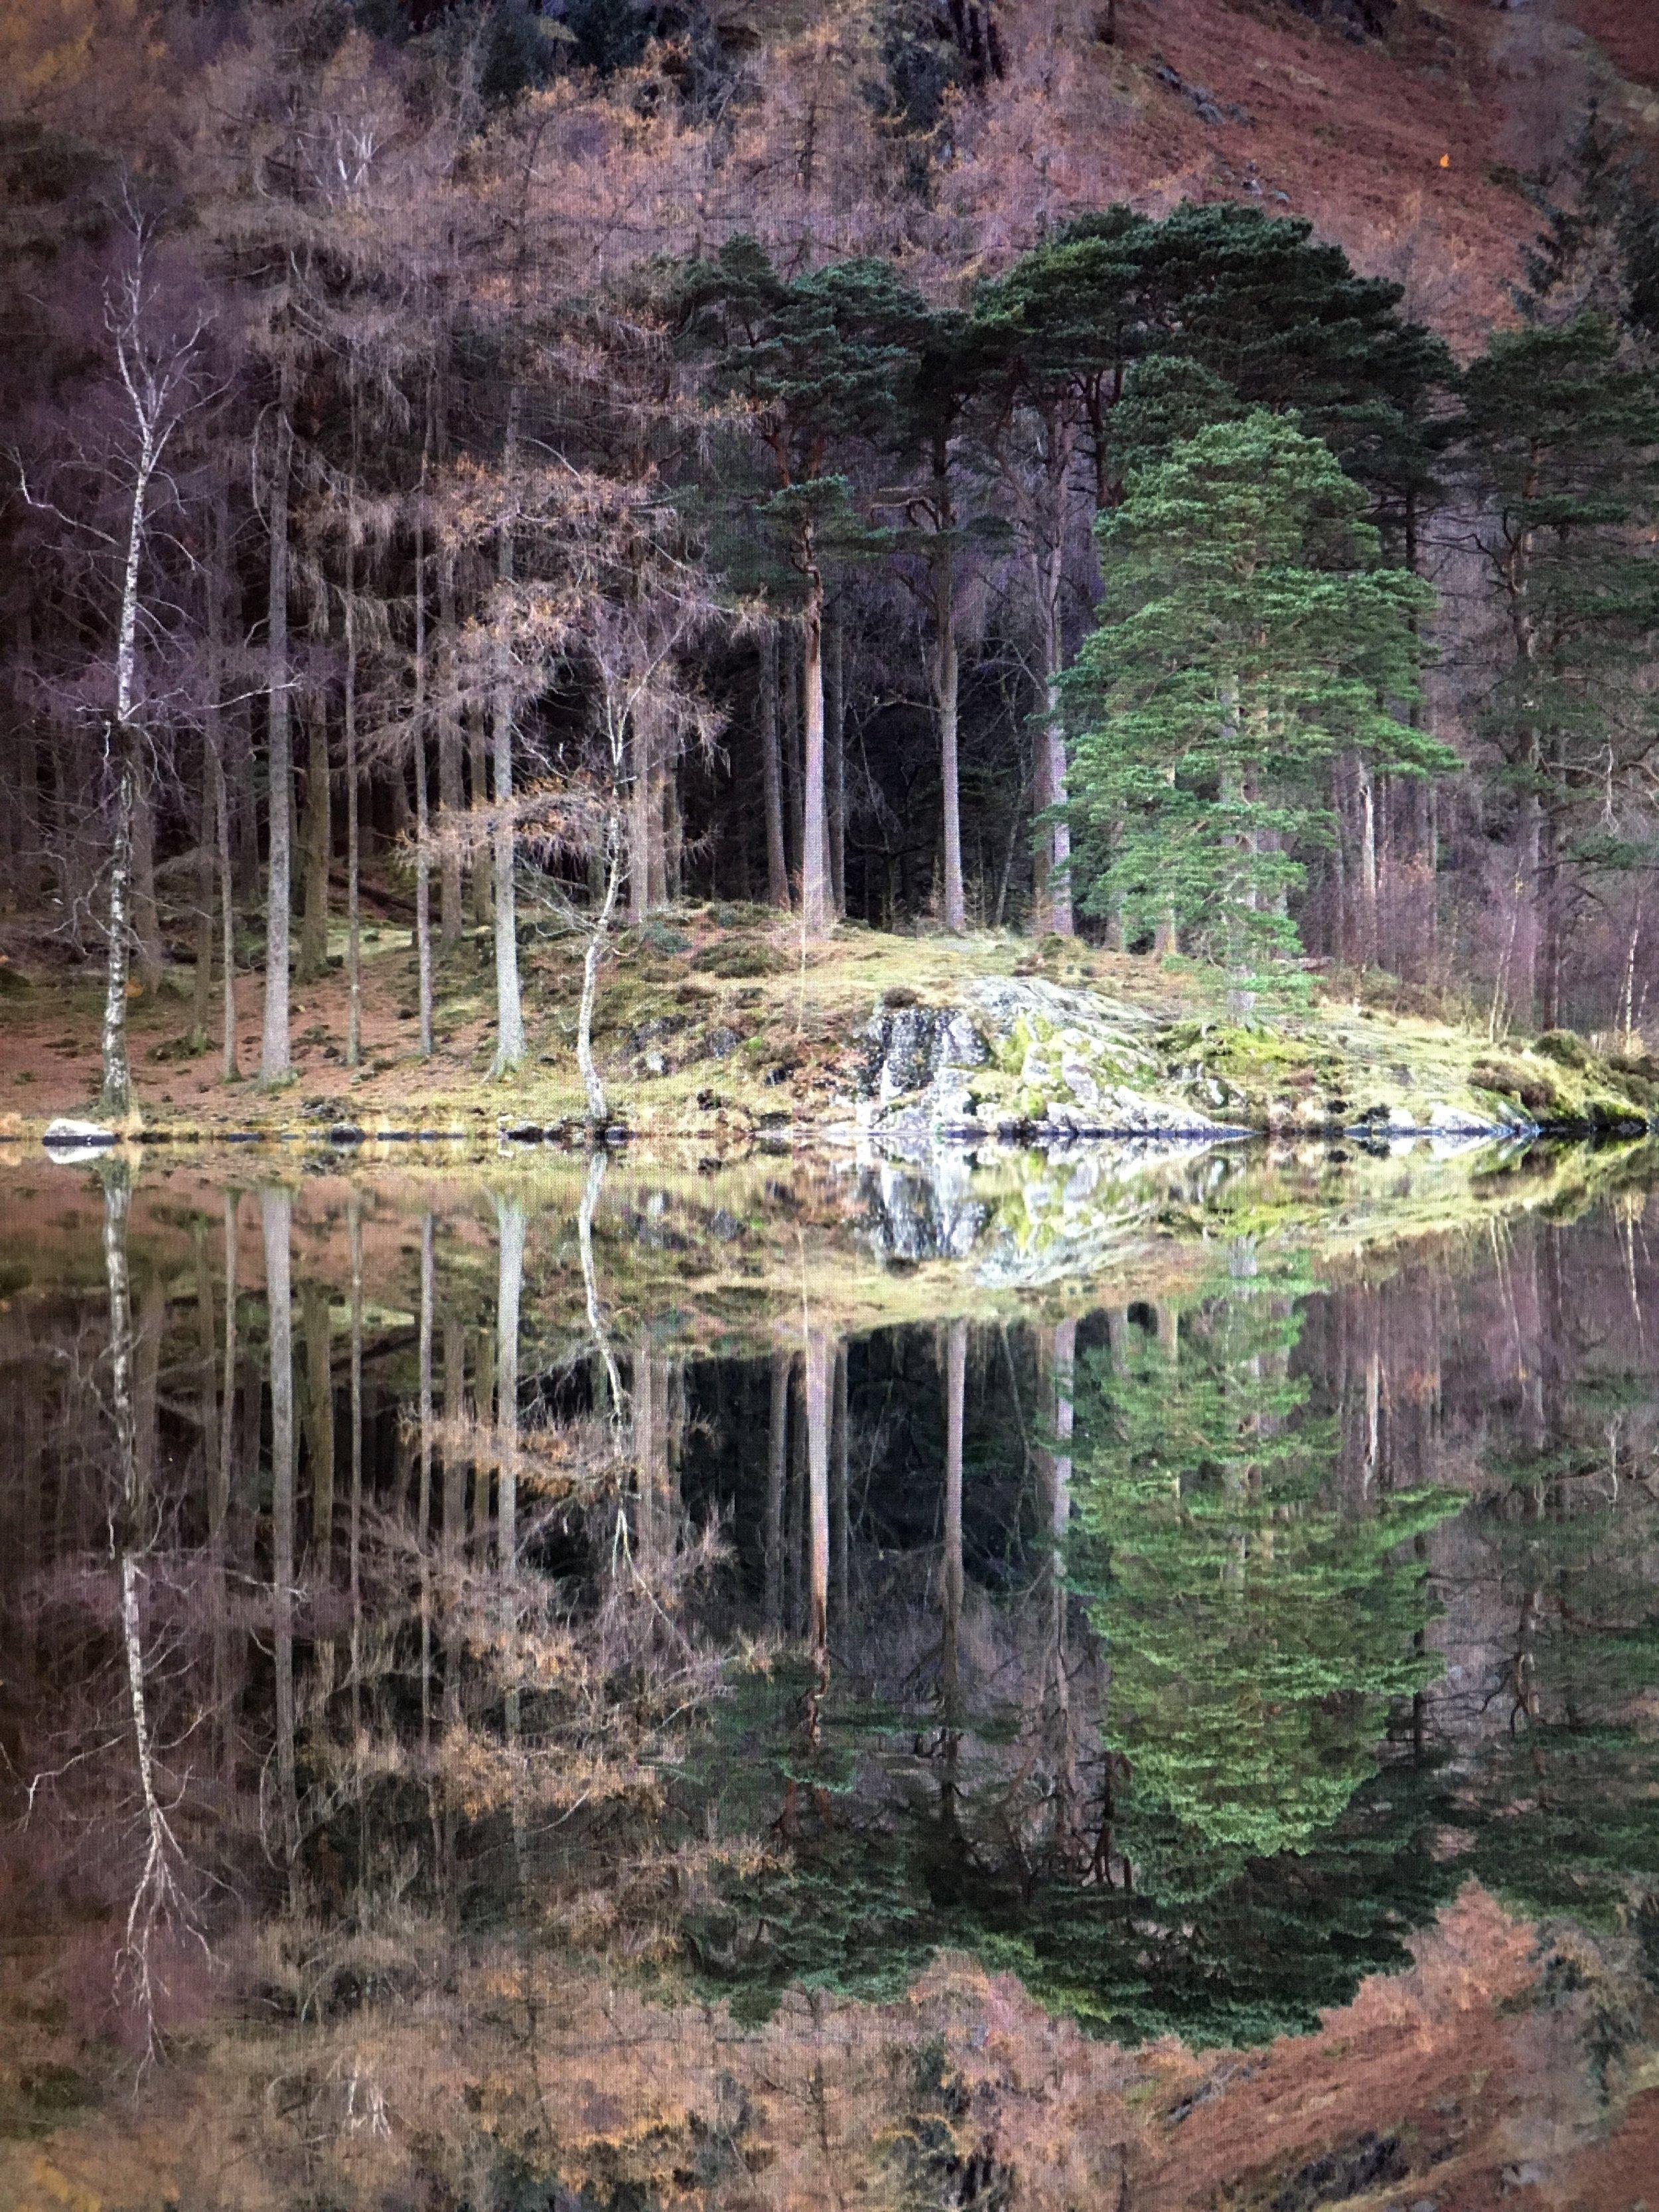 Blea Tarn Reflections. Screen shot from Lightroom